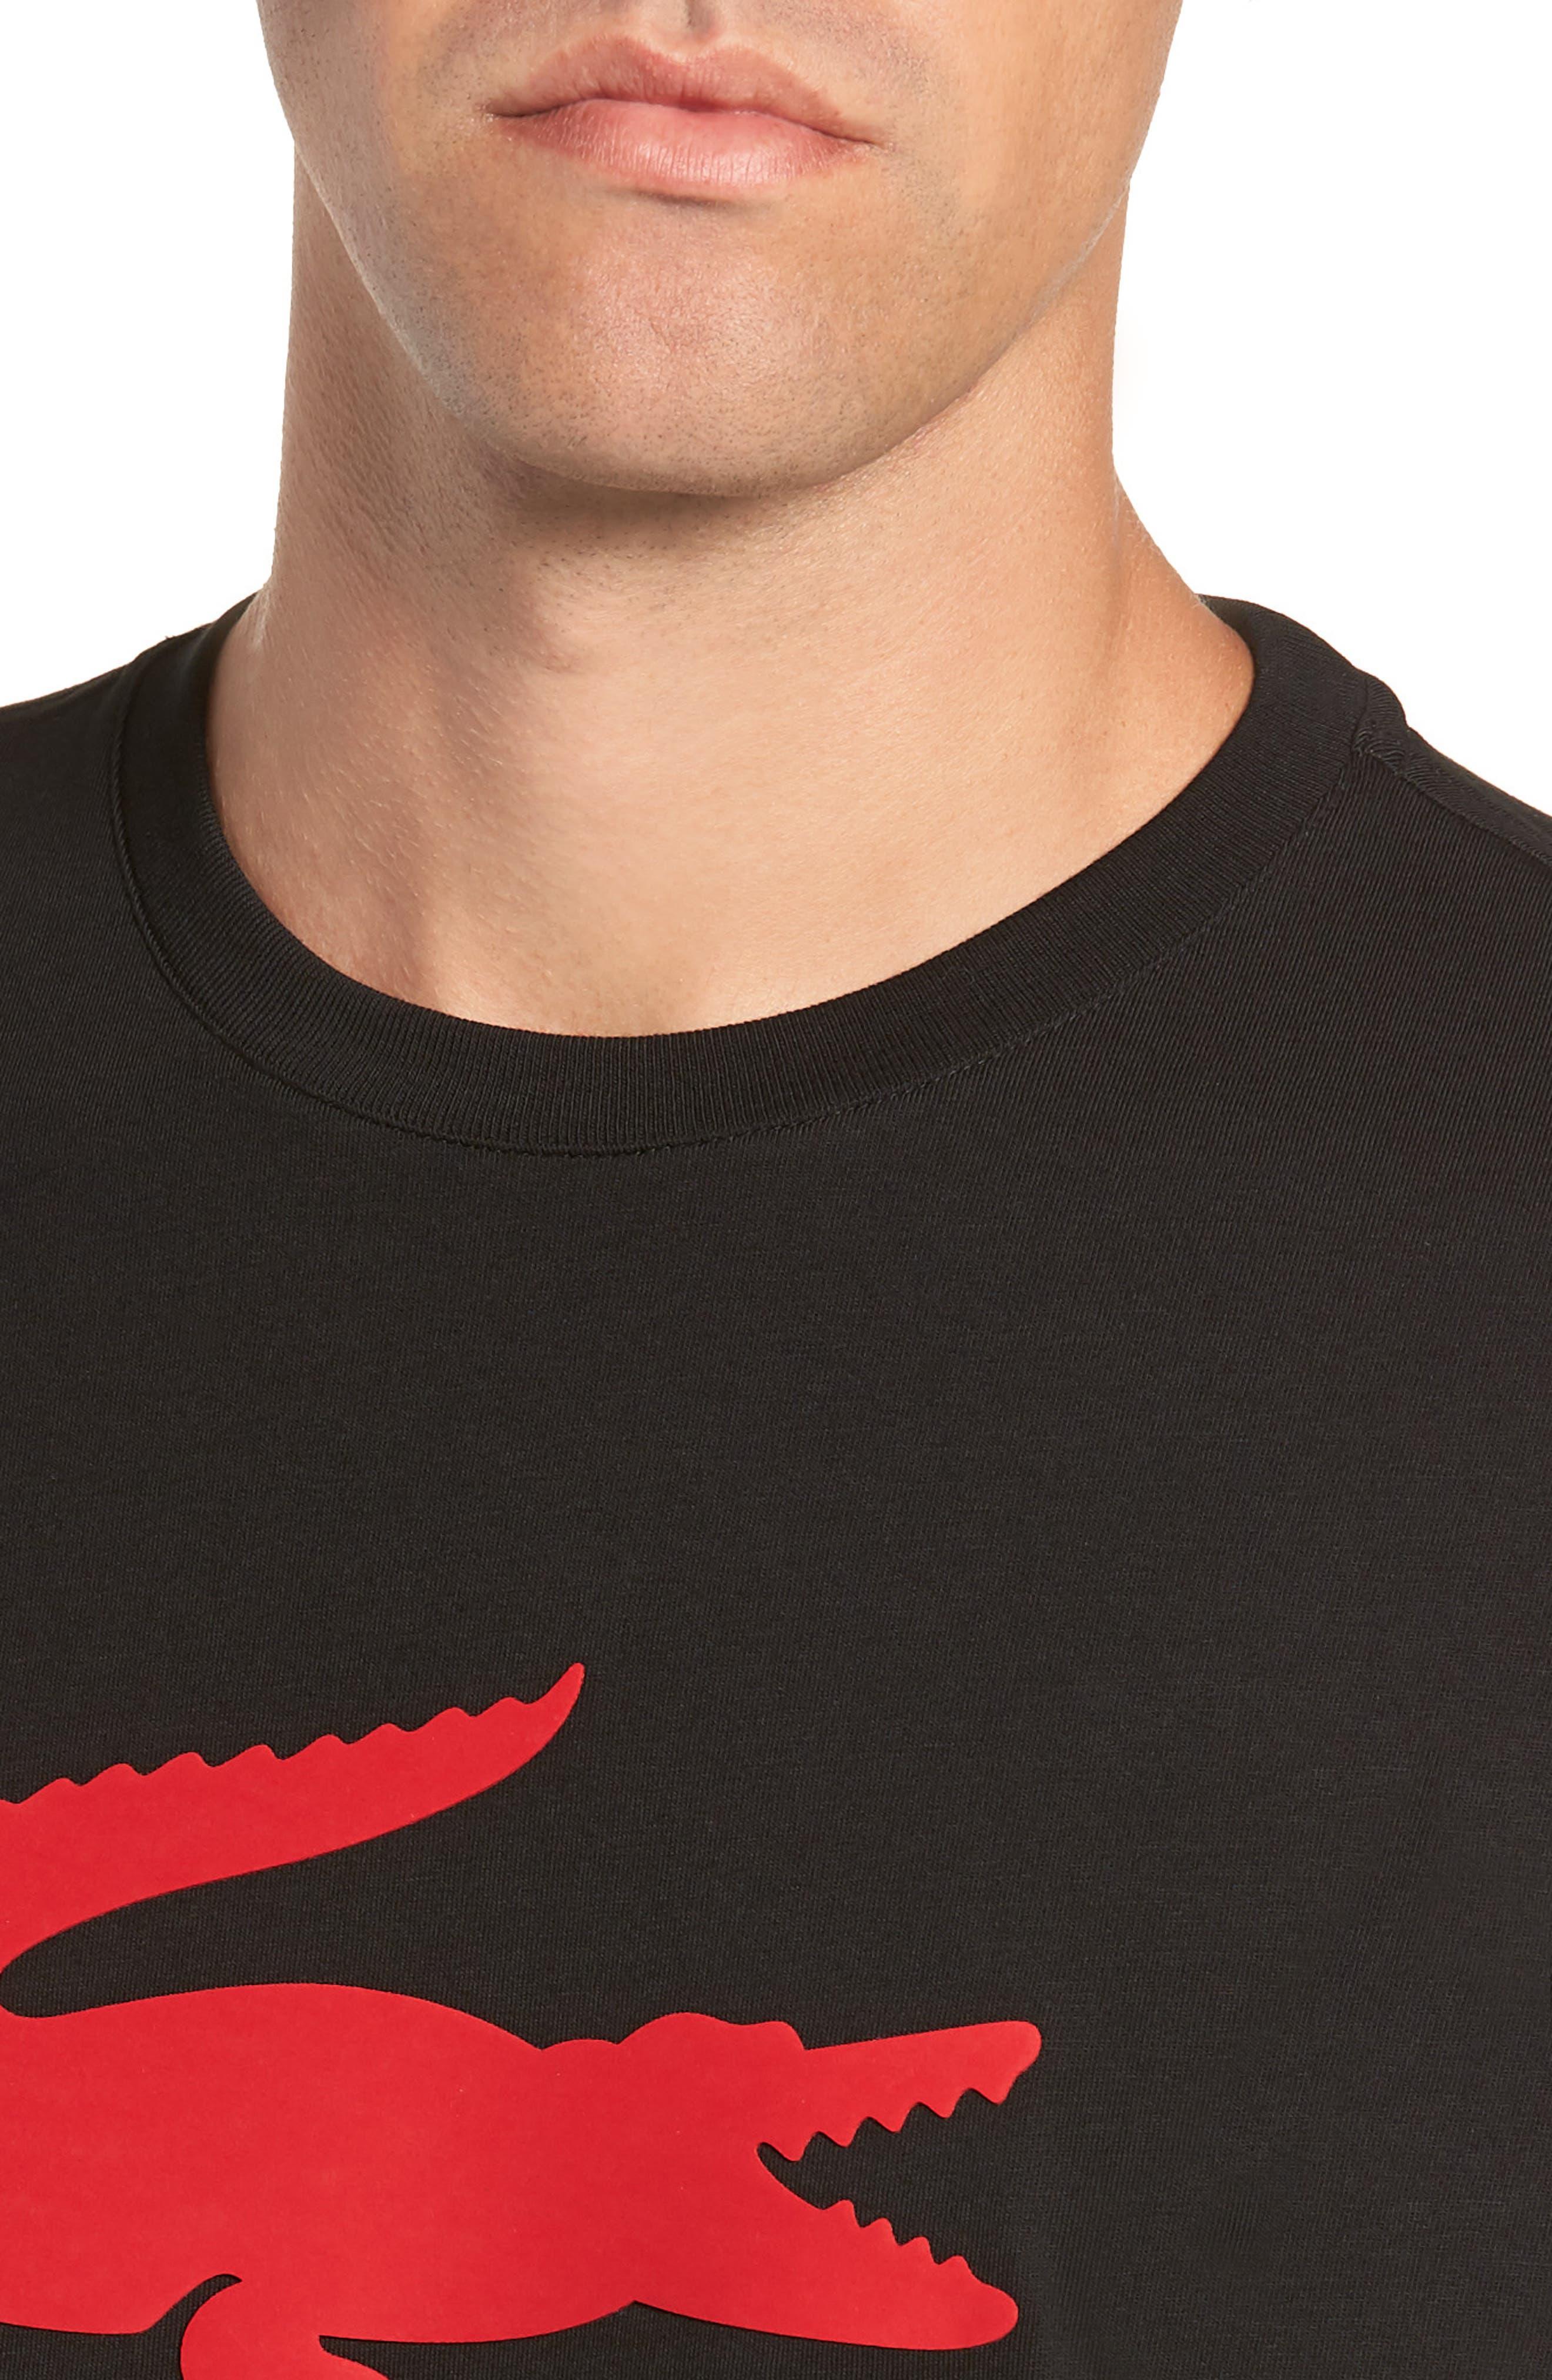 Crocodile T-Shirt,                             Alternate thumbnail 4, color,                             BLACK/ RED